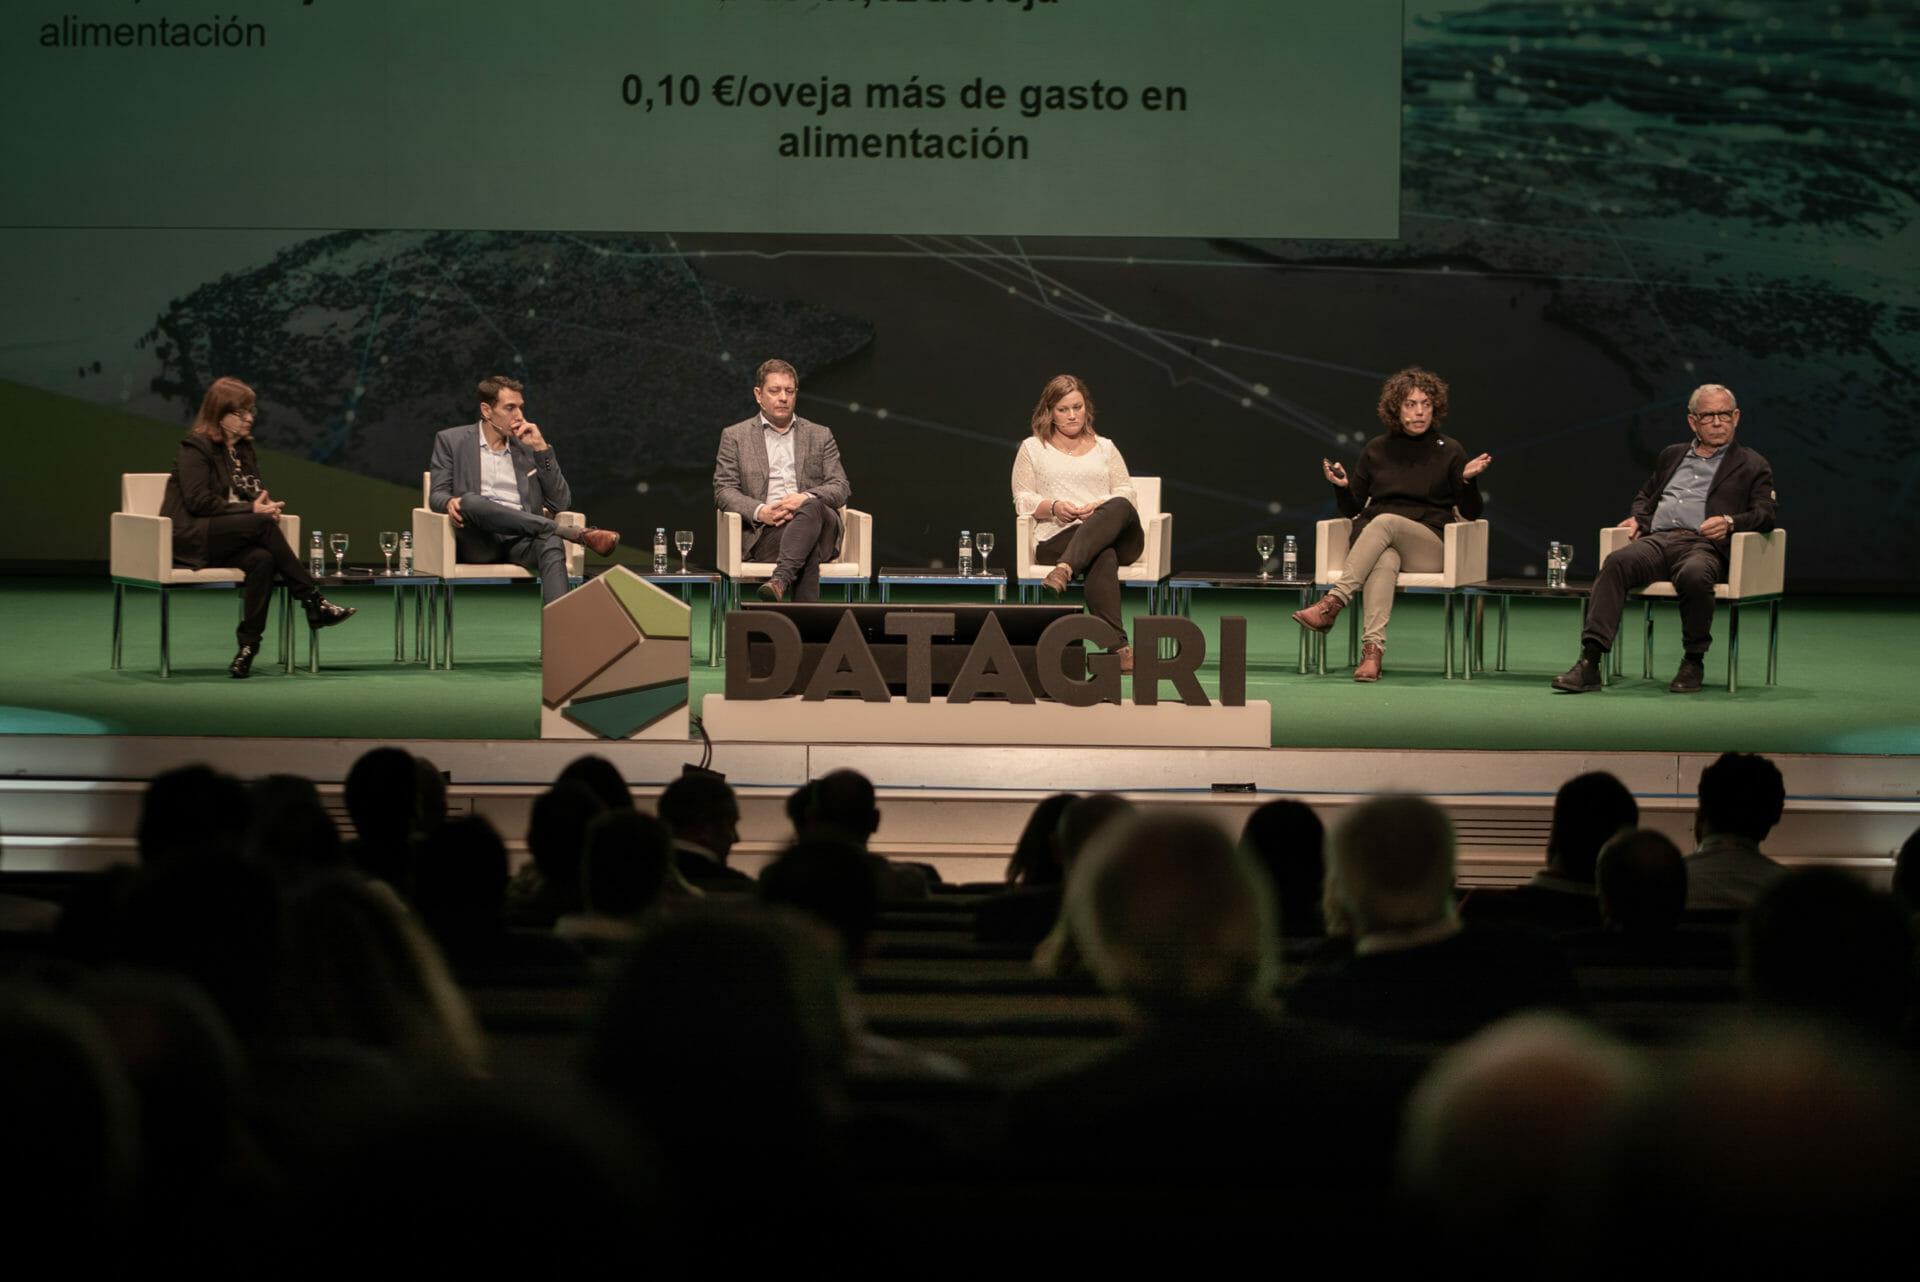 Datagri 2021 – la Transformación Digital Agro llega a LLeida